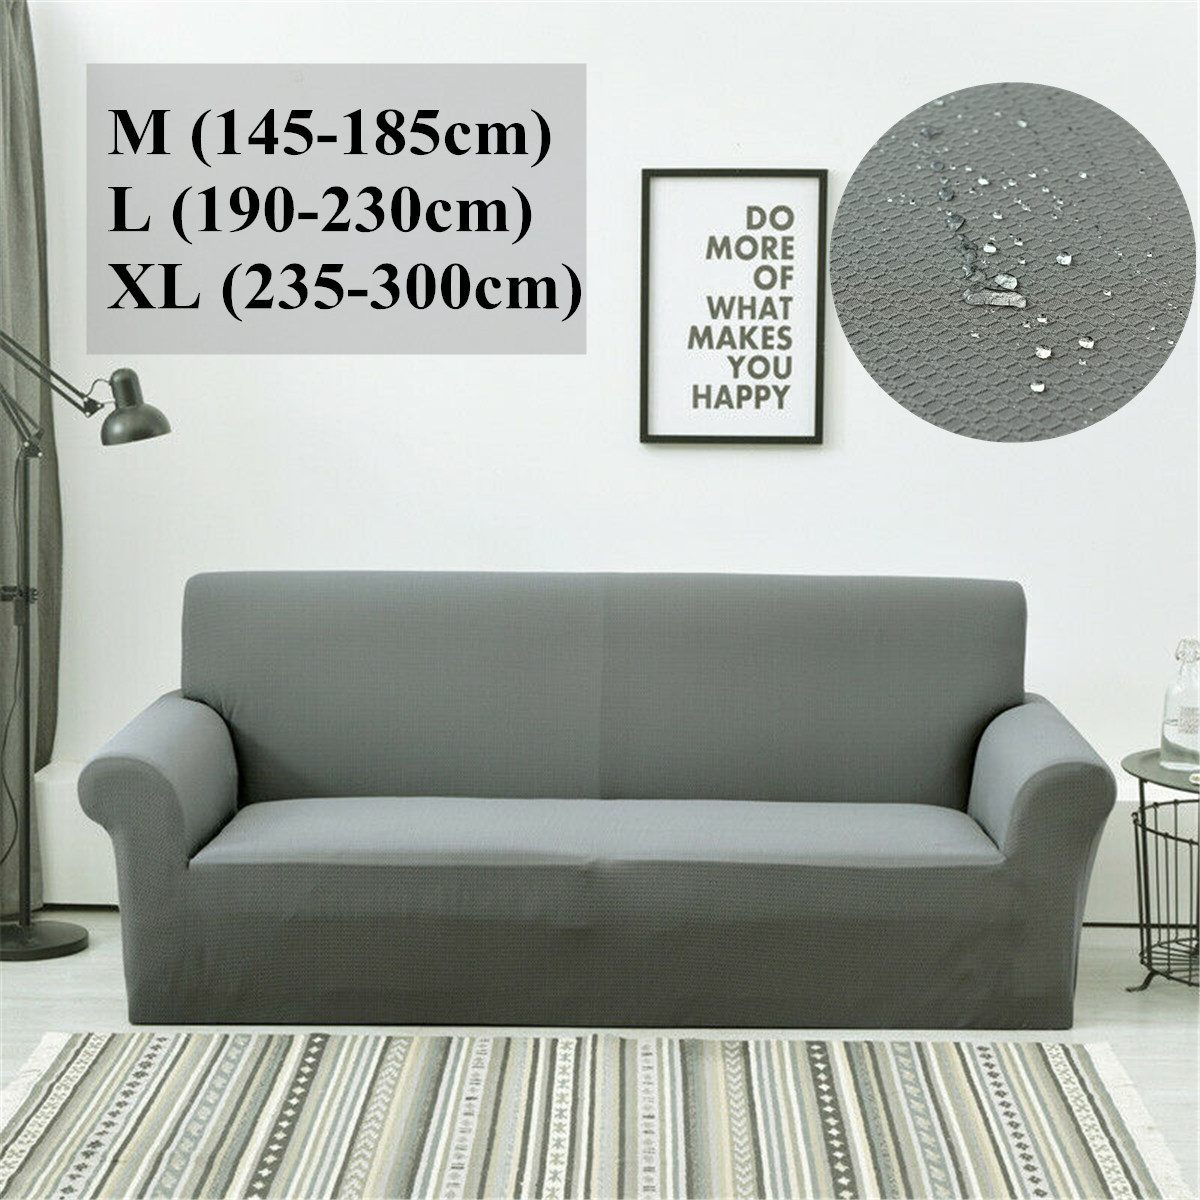 Funda de cojín para sofá resistente al agua de 145-185/190-230/235-300cm, almohadilla antideslizante para mascotas, toalla de sofá para pañales, Color sólido Universal Nórdico